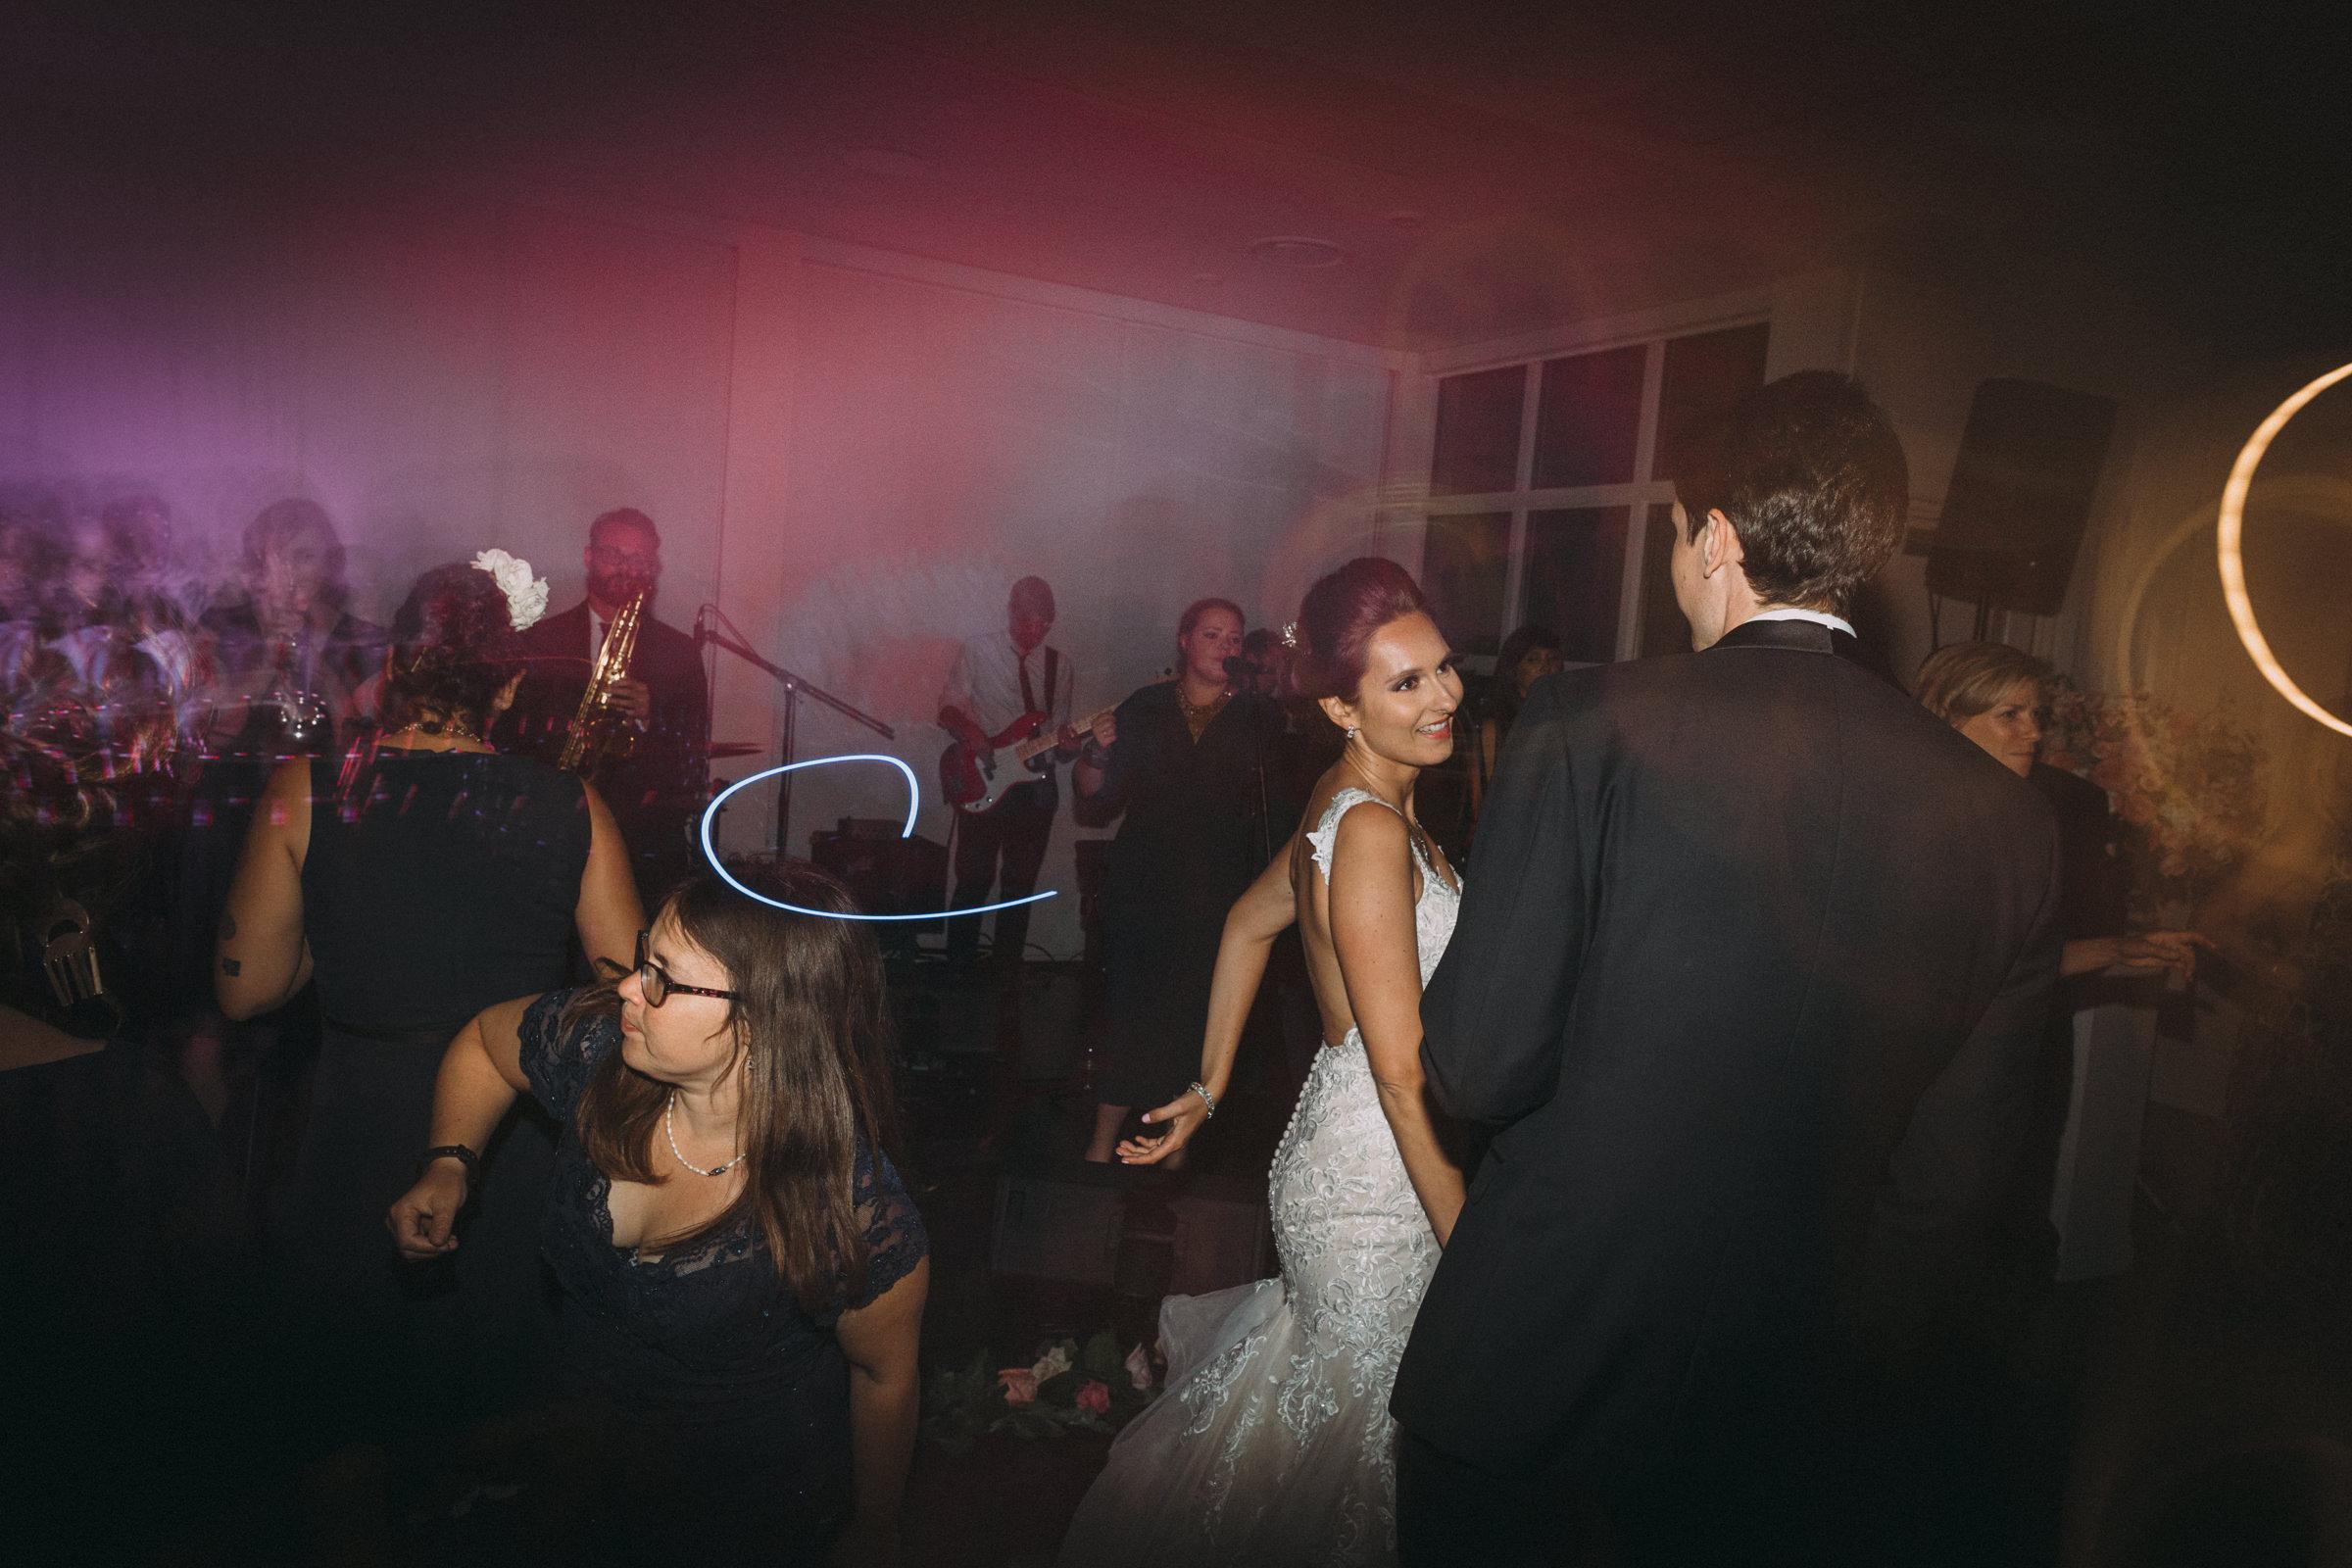 Langdon-Hall-wedding-photography-Cambridge-by-Sam-Wong-of-Visual-Cravings_Sarah-Ryan_59.jpg